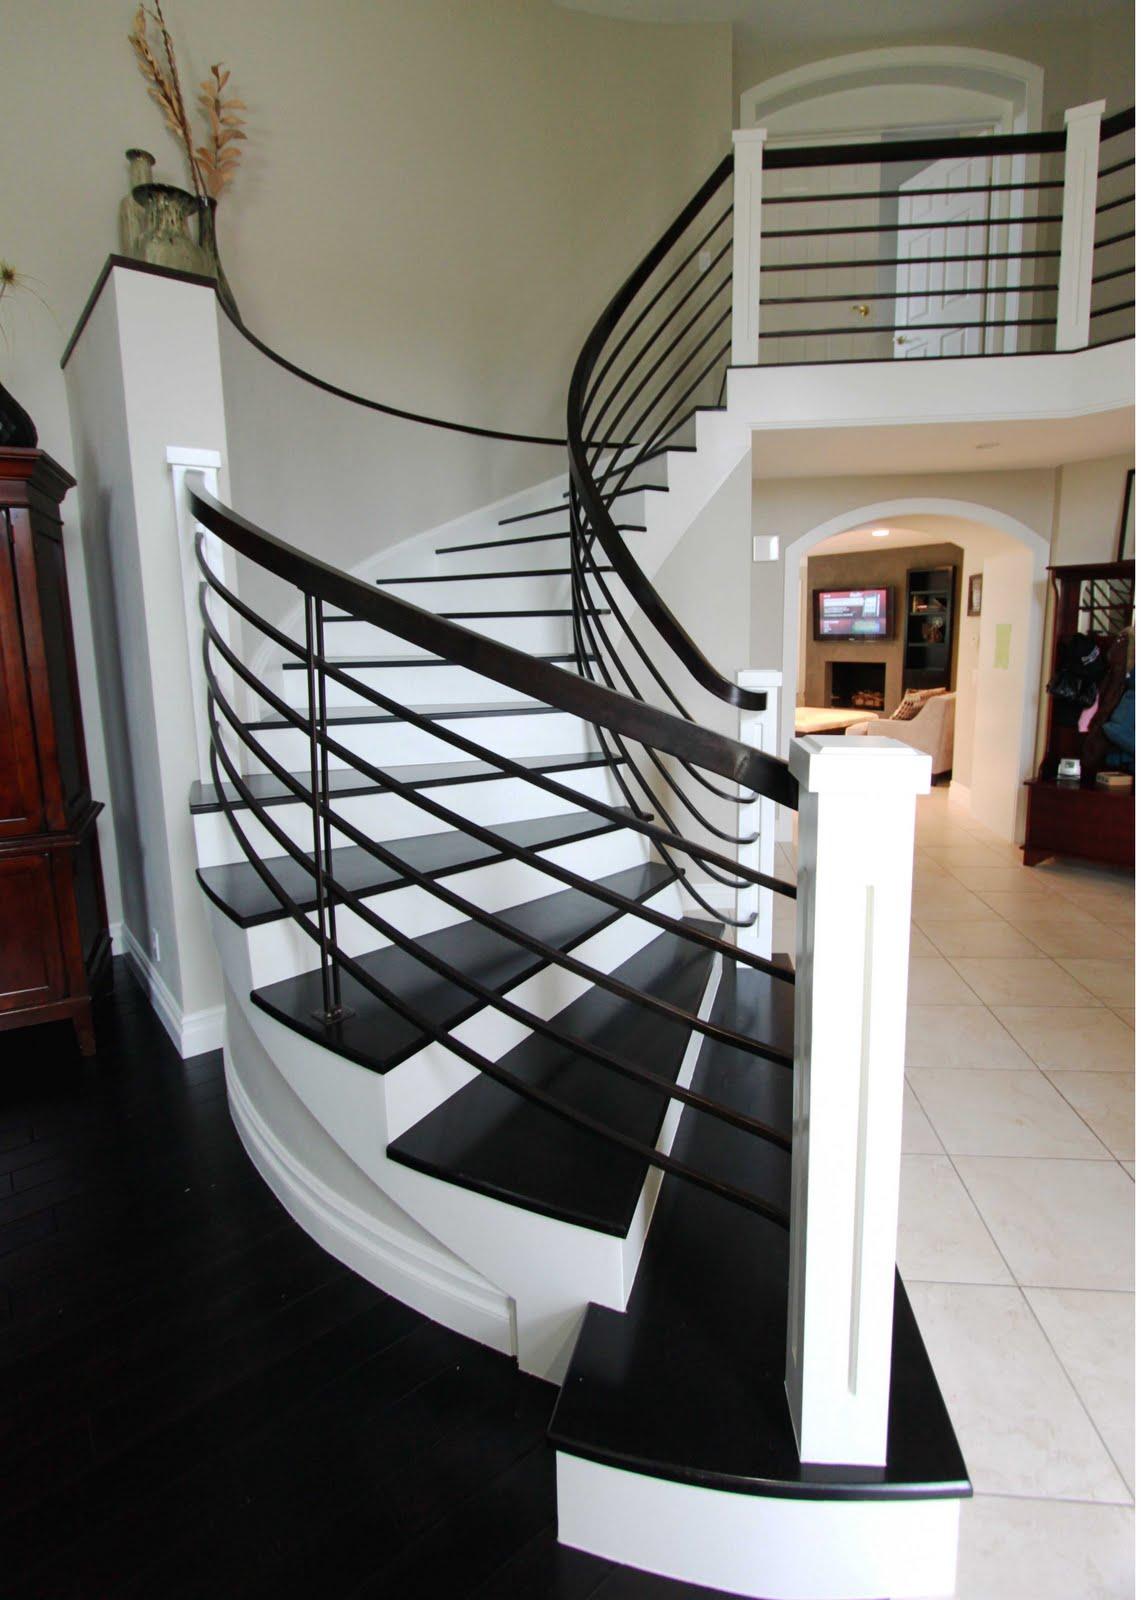 Best Images Modern Staircase Ideas On Staircase Ideas: Fischer Interior Design: Stairway To Heaven